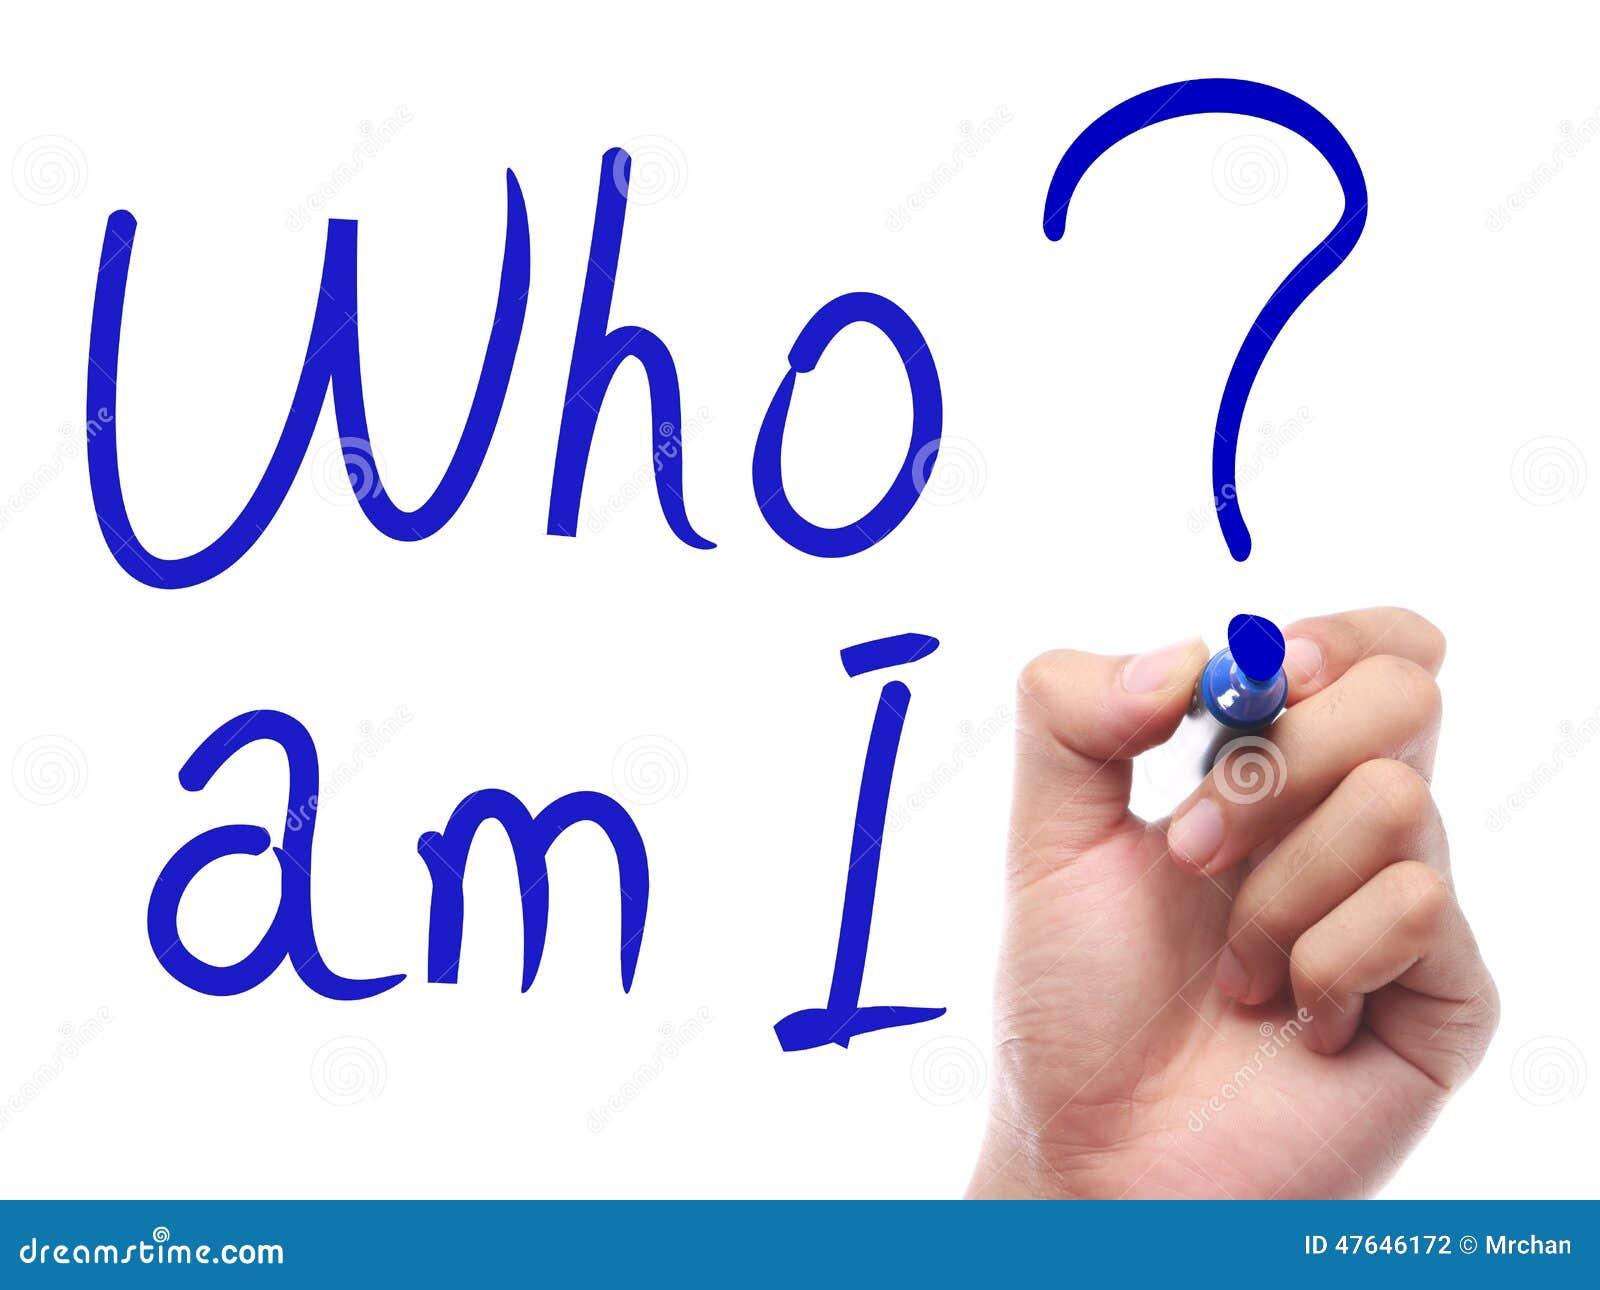 Who Am I? Understanding Credentials